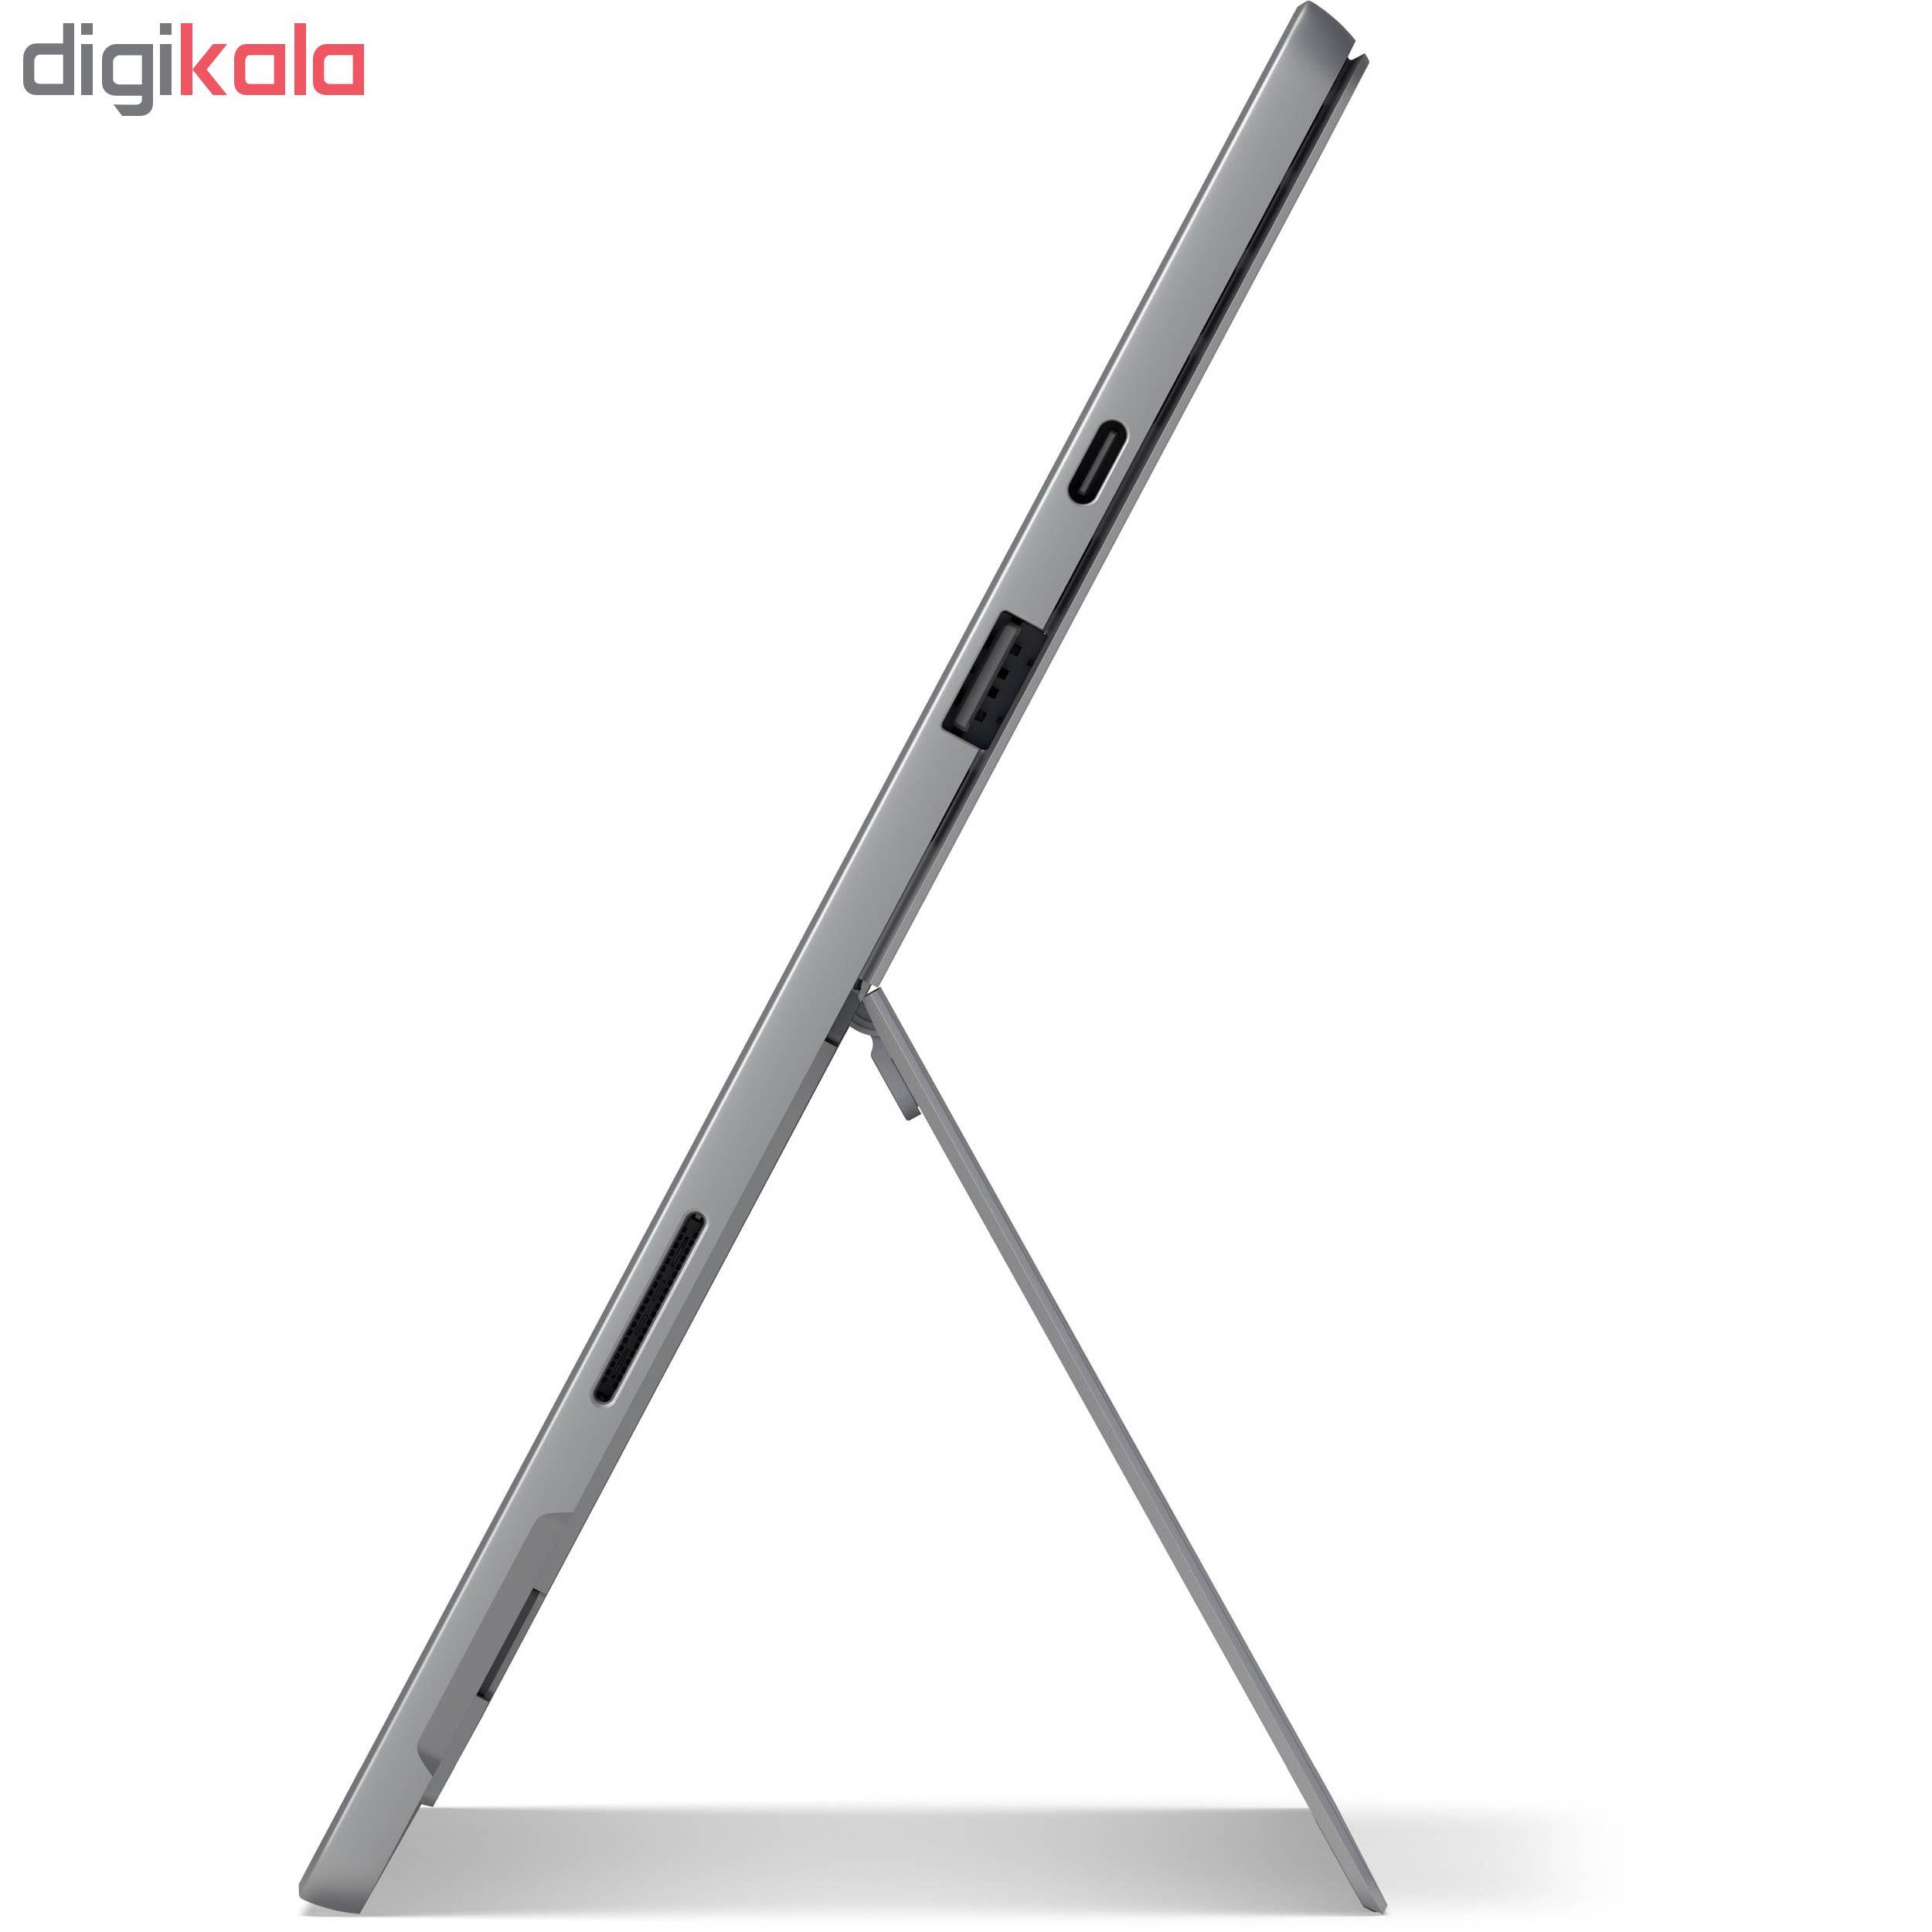 تبلت مایکروسافت مدل Surface Pro 7 - B به همراه کیبورد Black Type Cover main 1 6